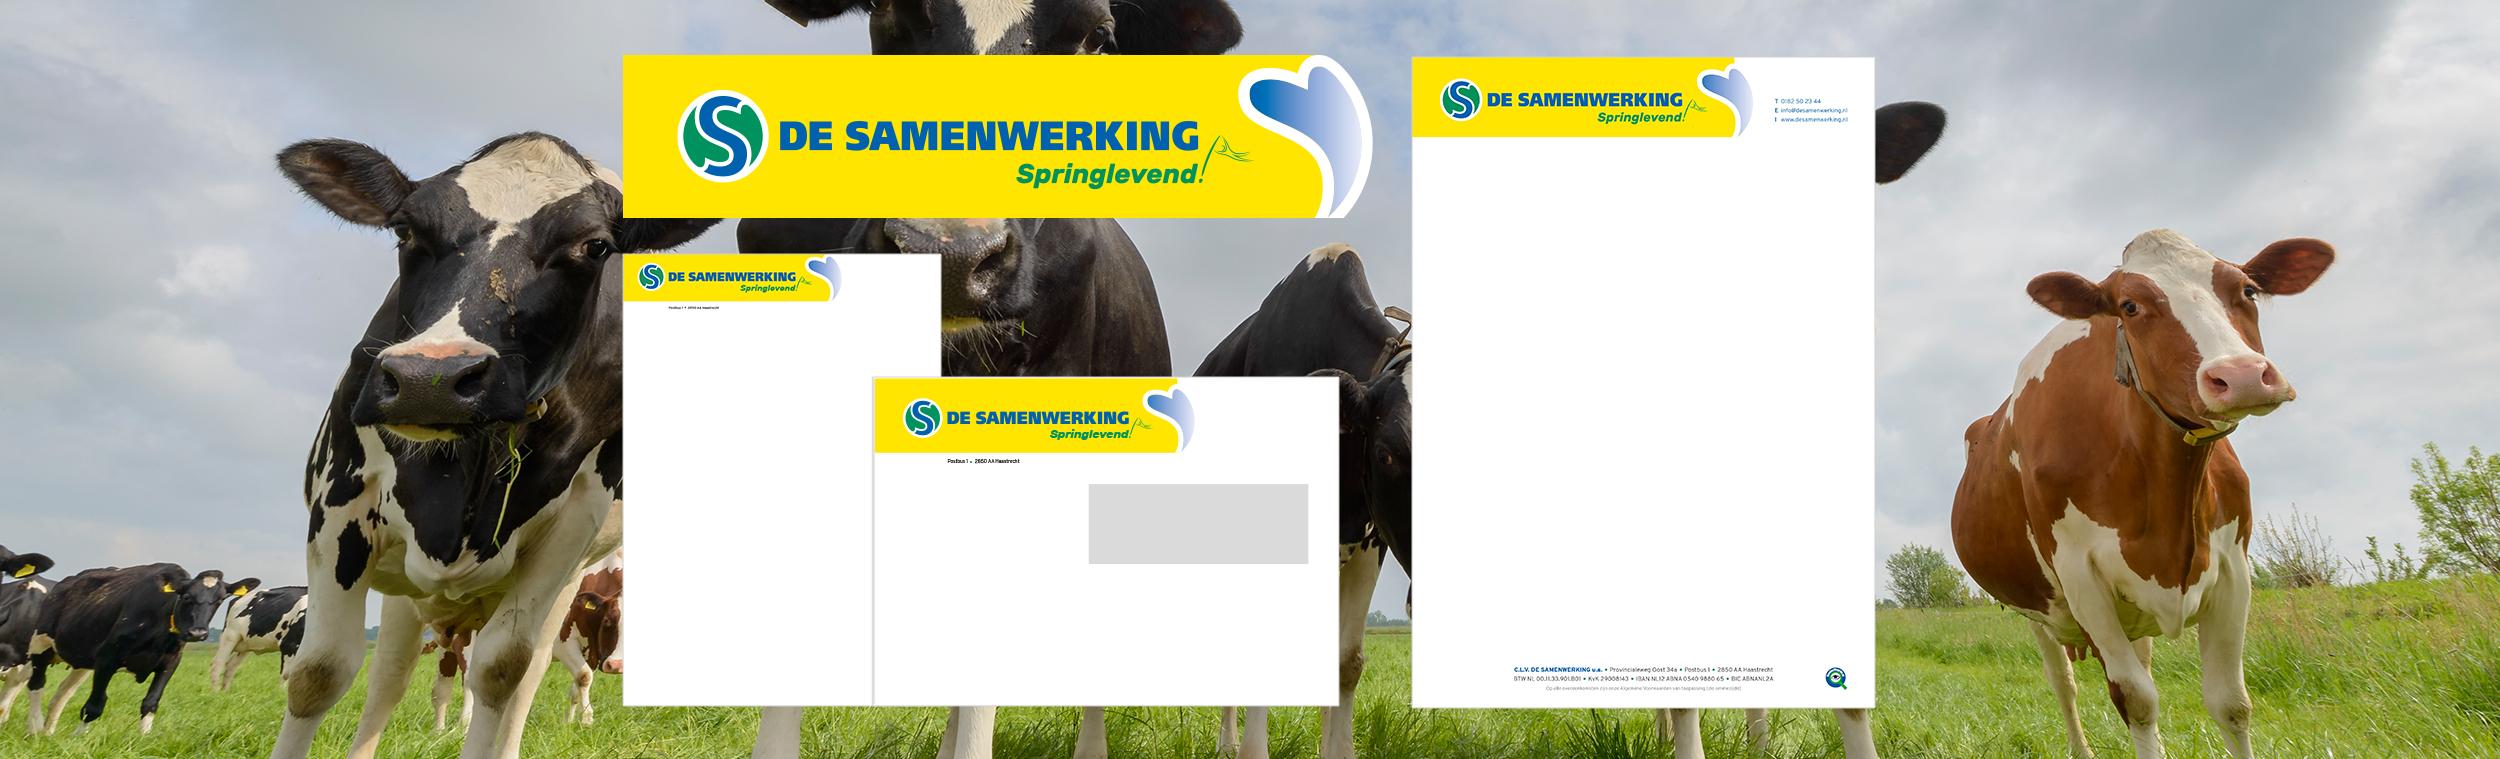 portfolio-DeSamenwerking-huisstijl-2500x759-1